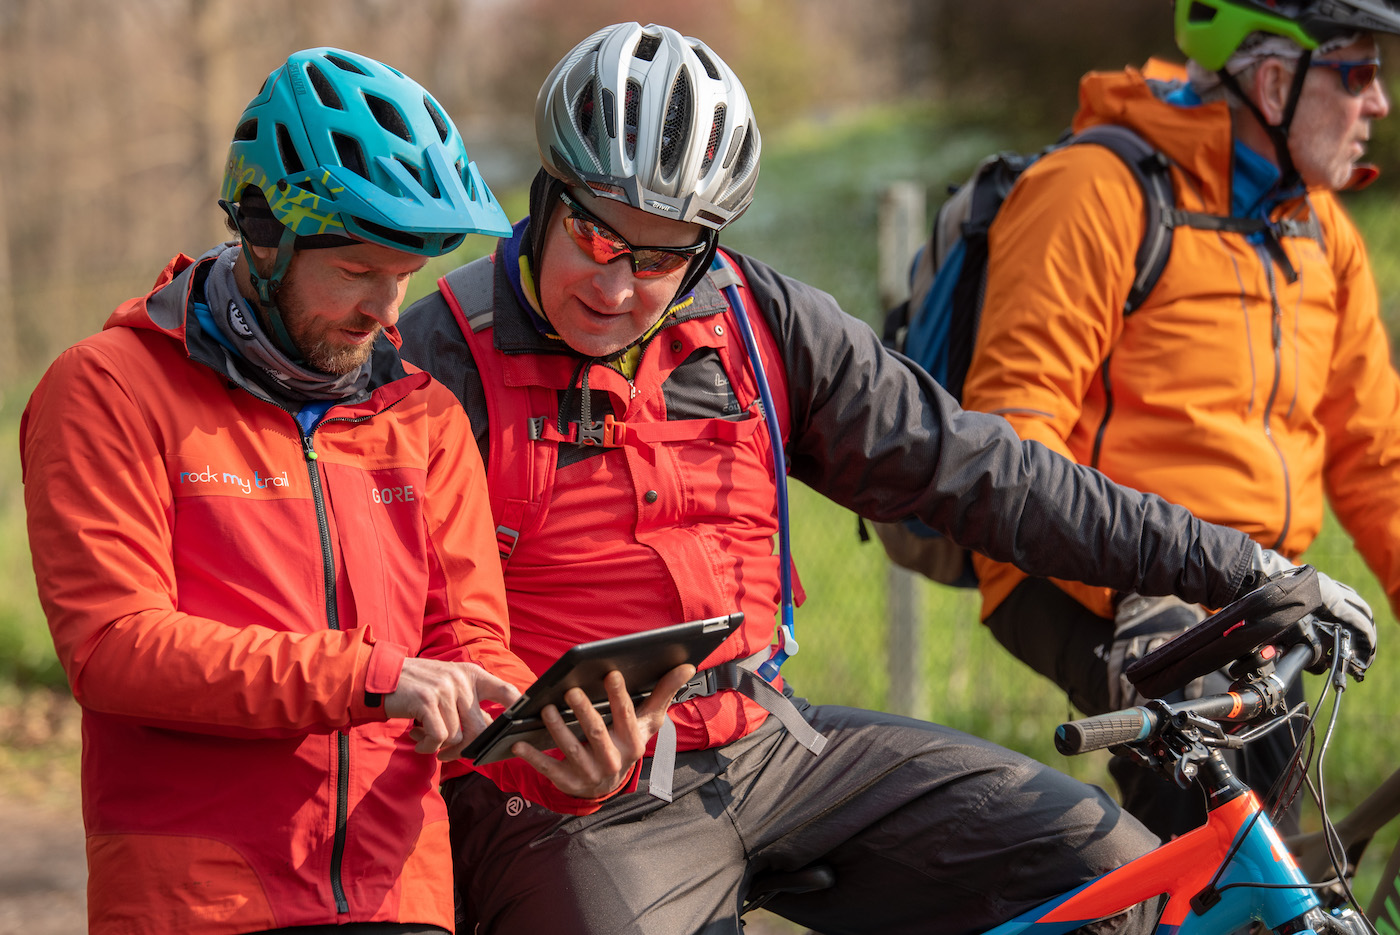 eMTB eBike Fortgeschritten Fahrtechnik Kurs in Siegen - Rock my Trail Bikeschule329